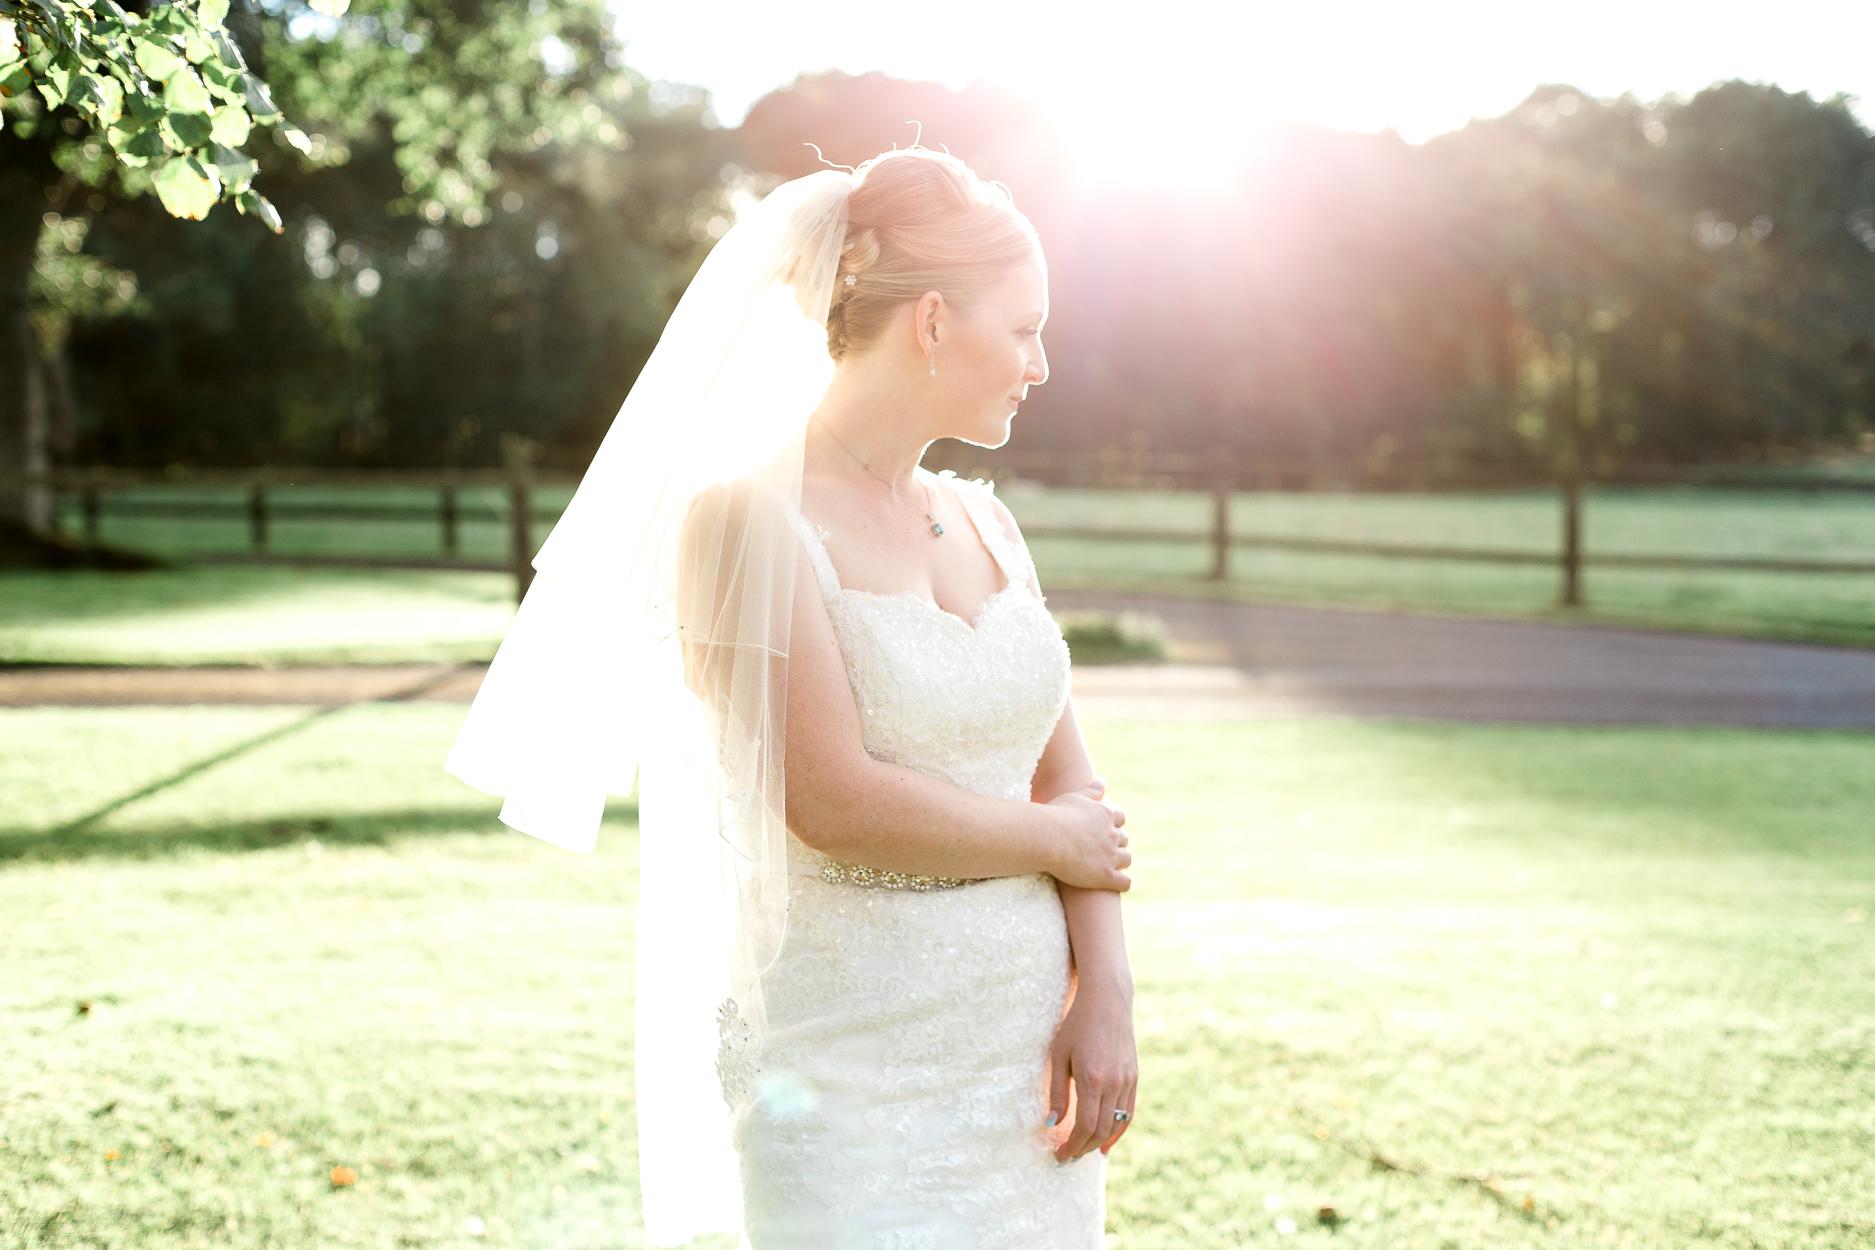 anna beth wedding photography prices